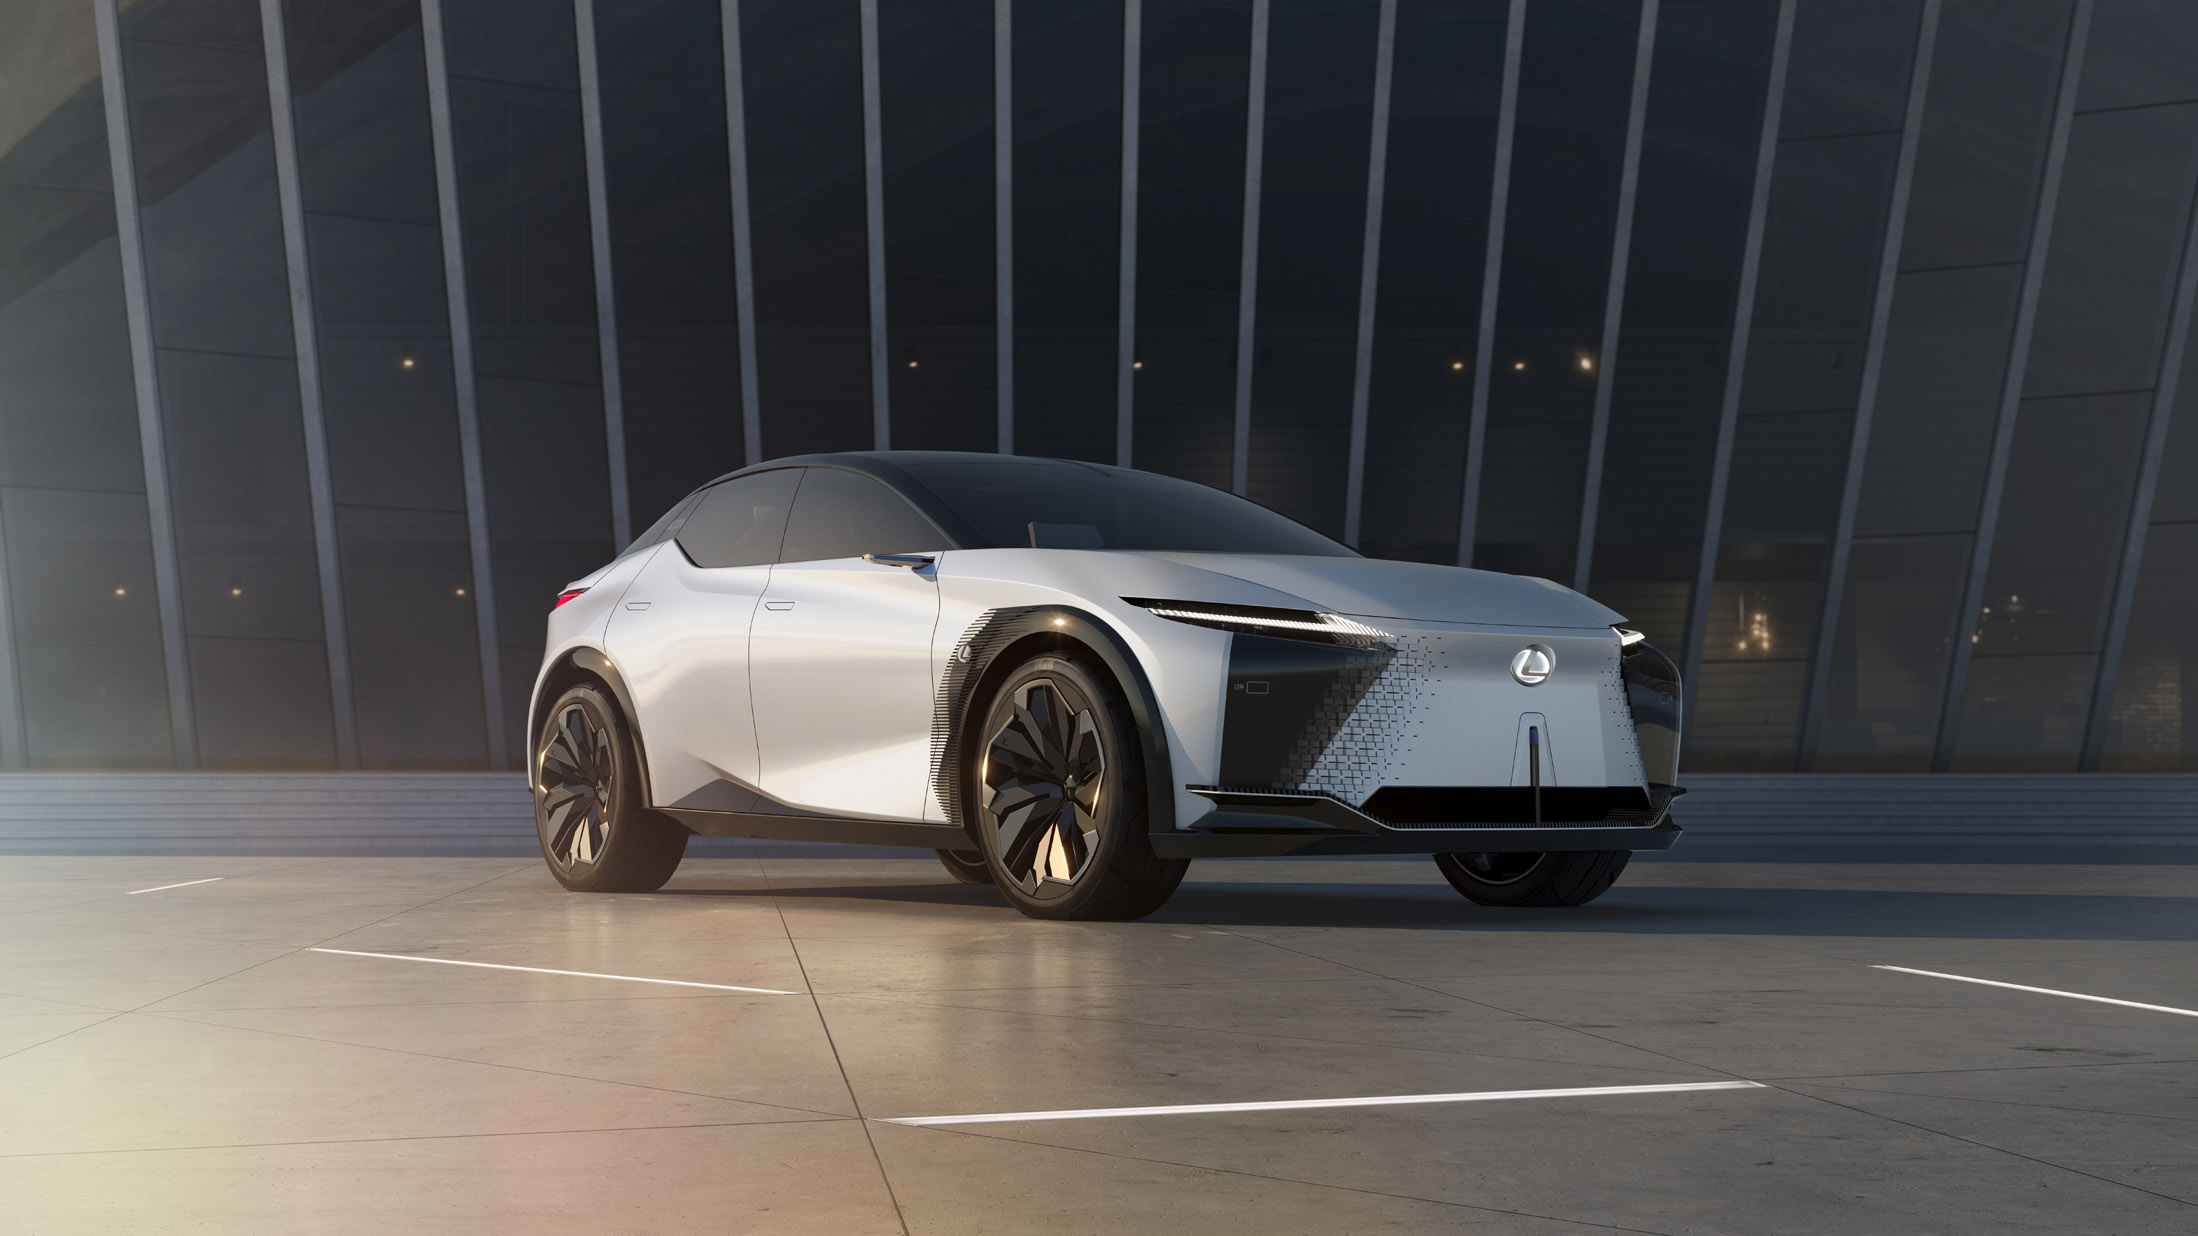 04-Lexus-LF-Z-Electrified